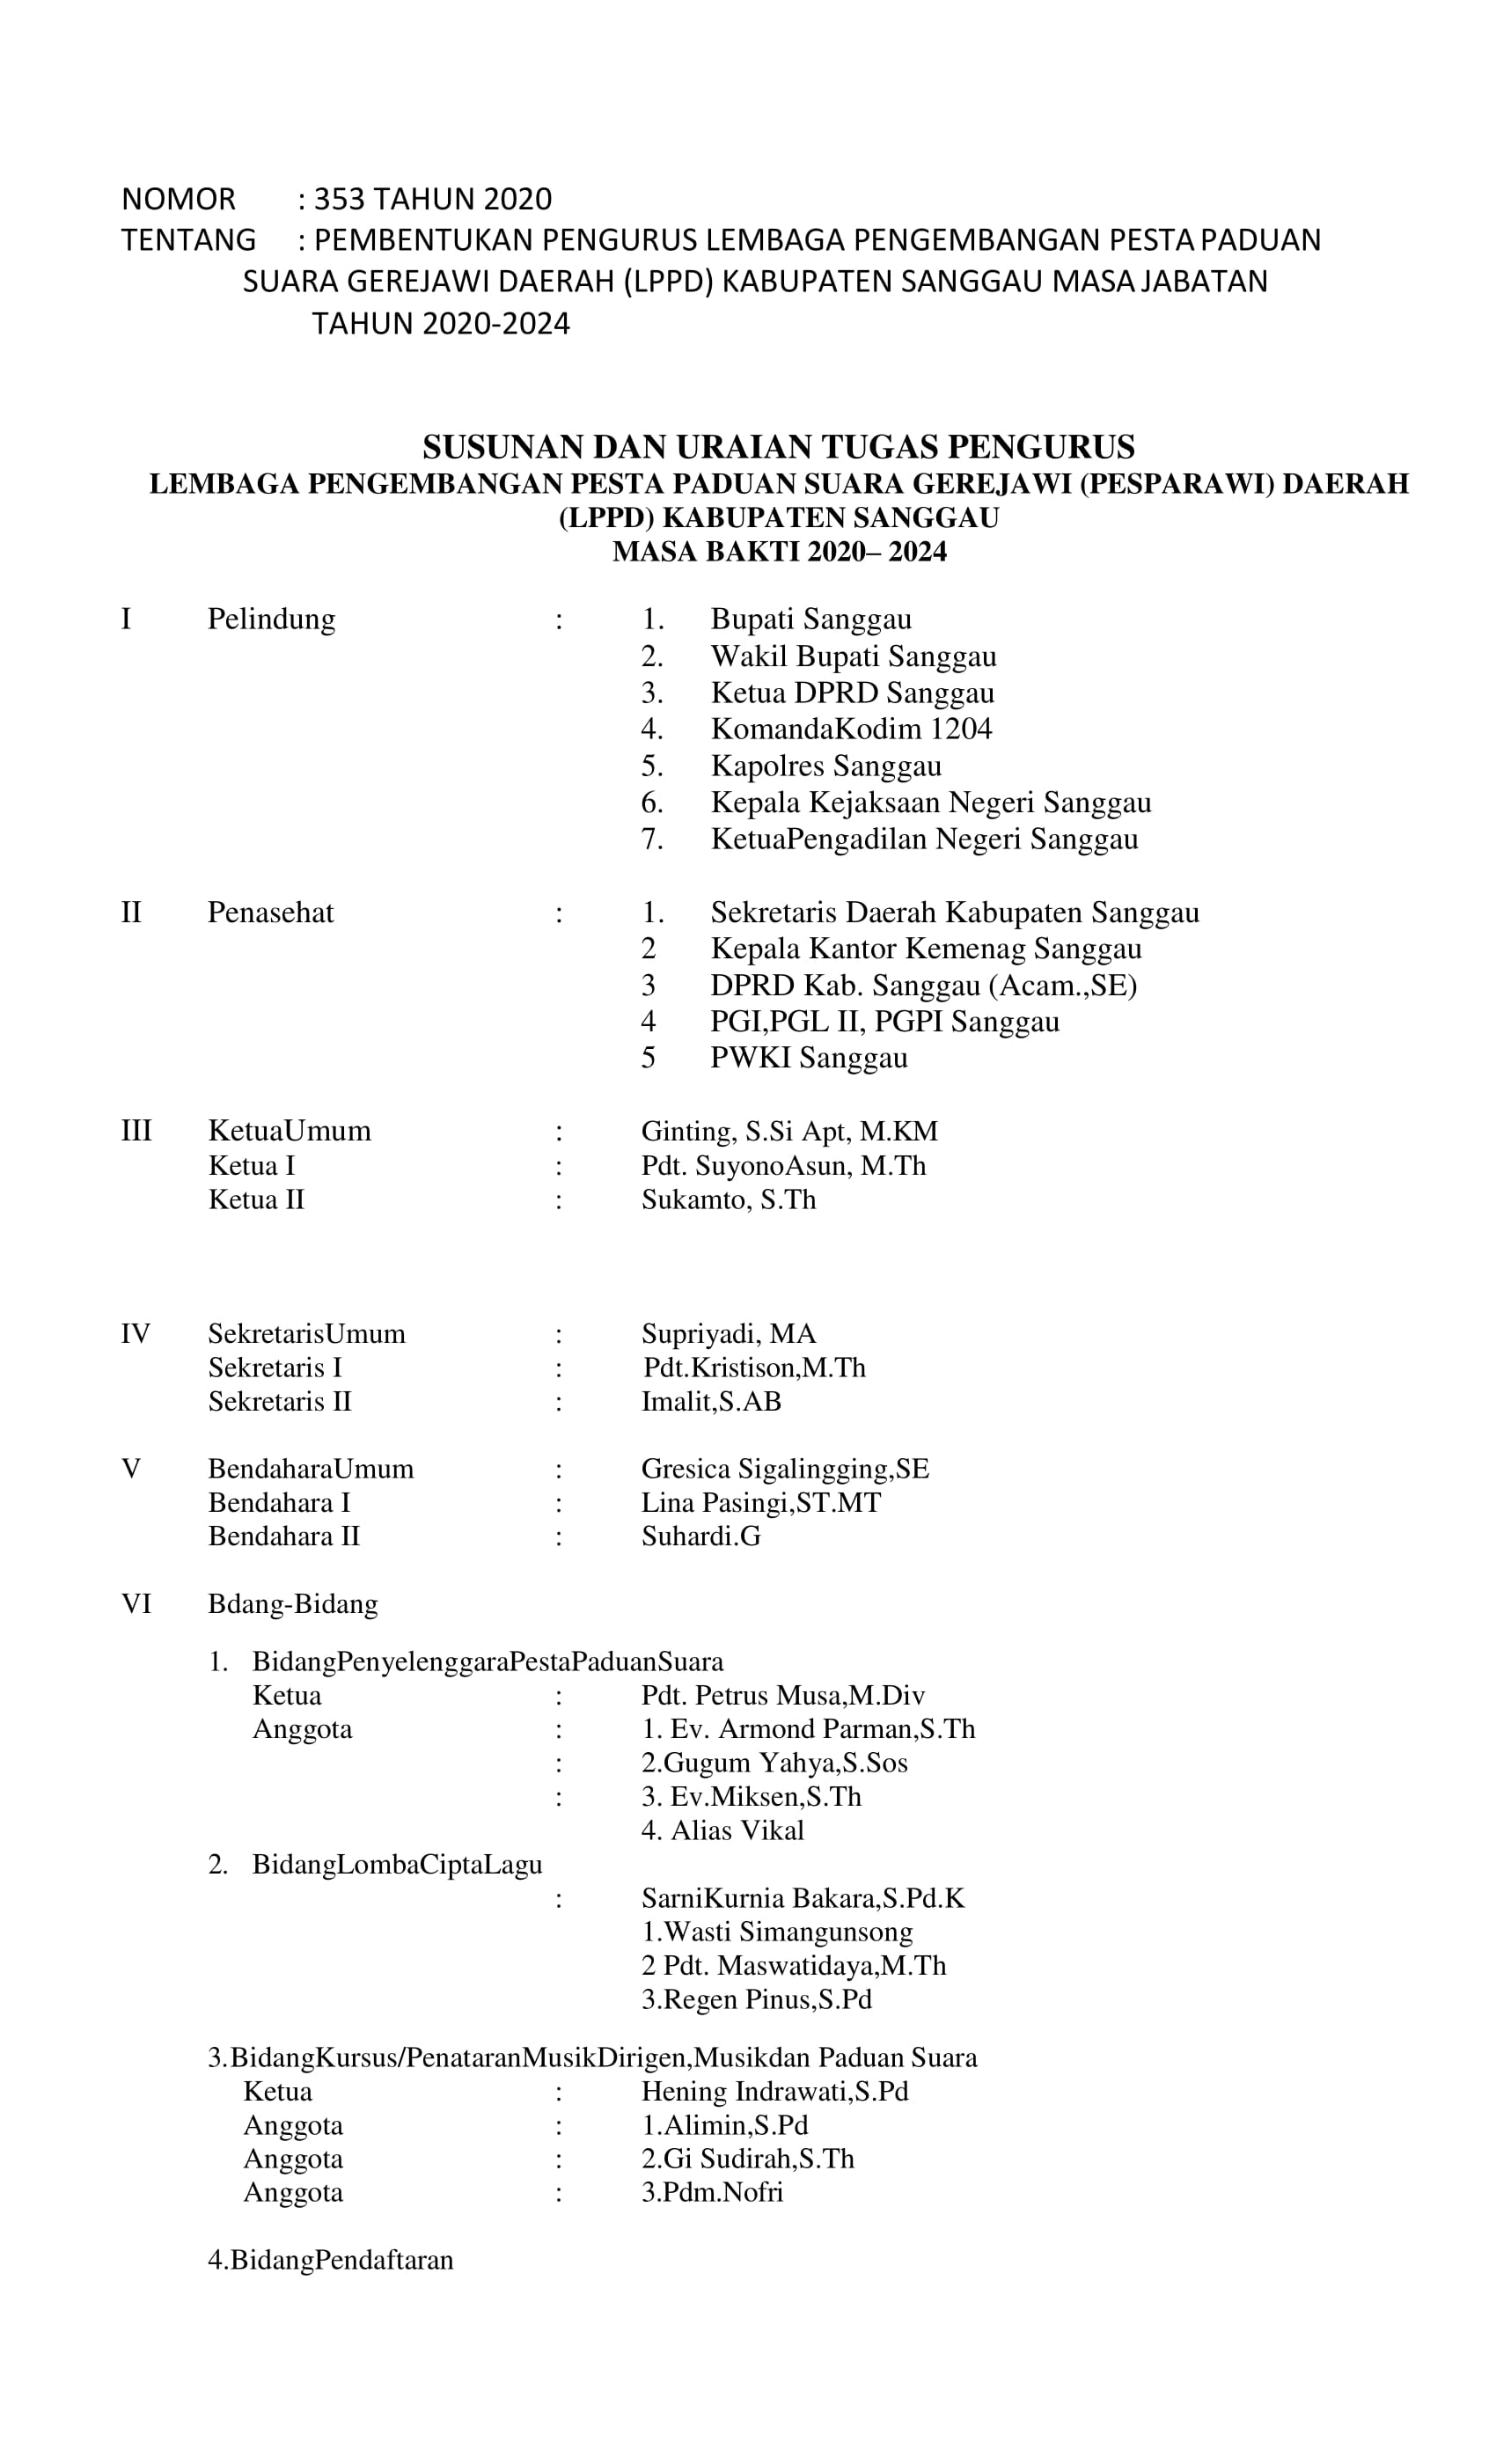 BUPATI SANGGAU… (3) (1)-3